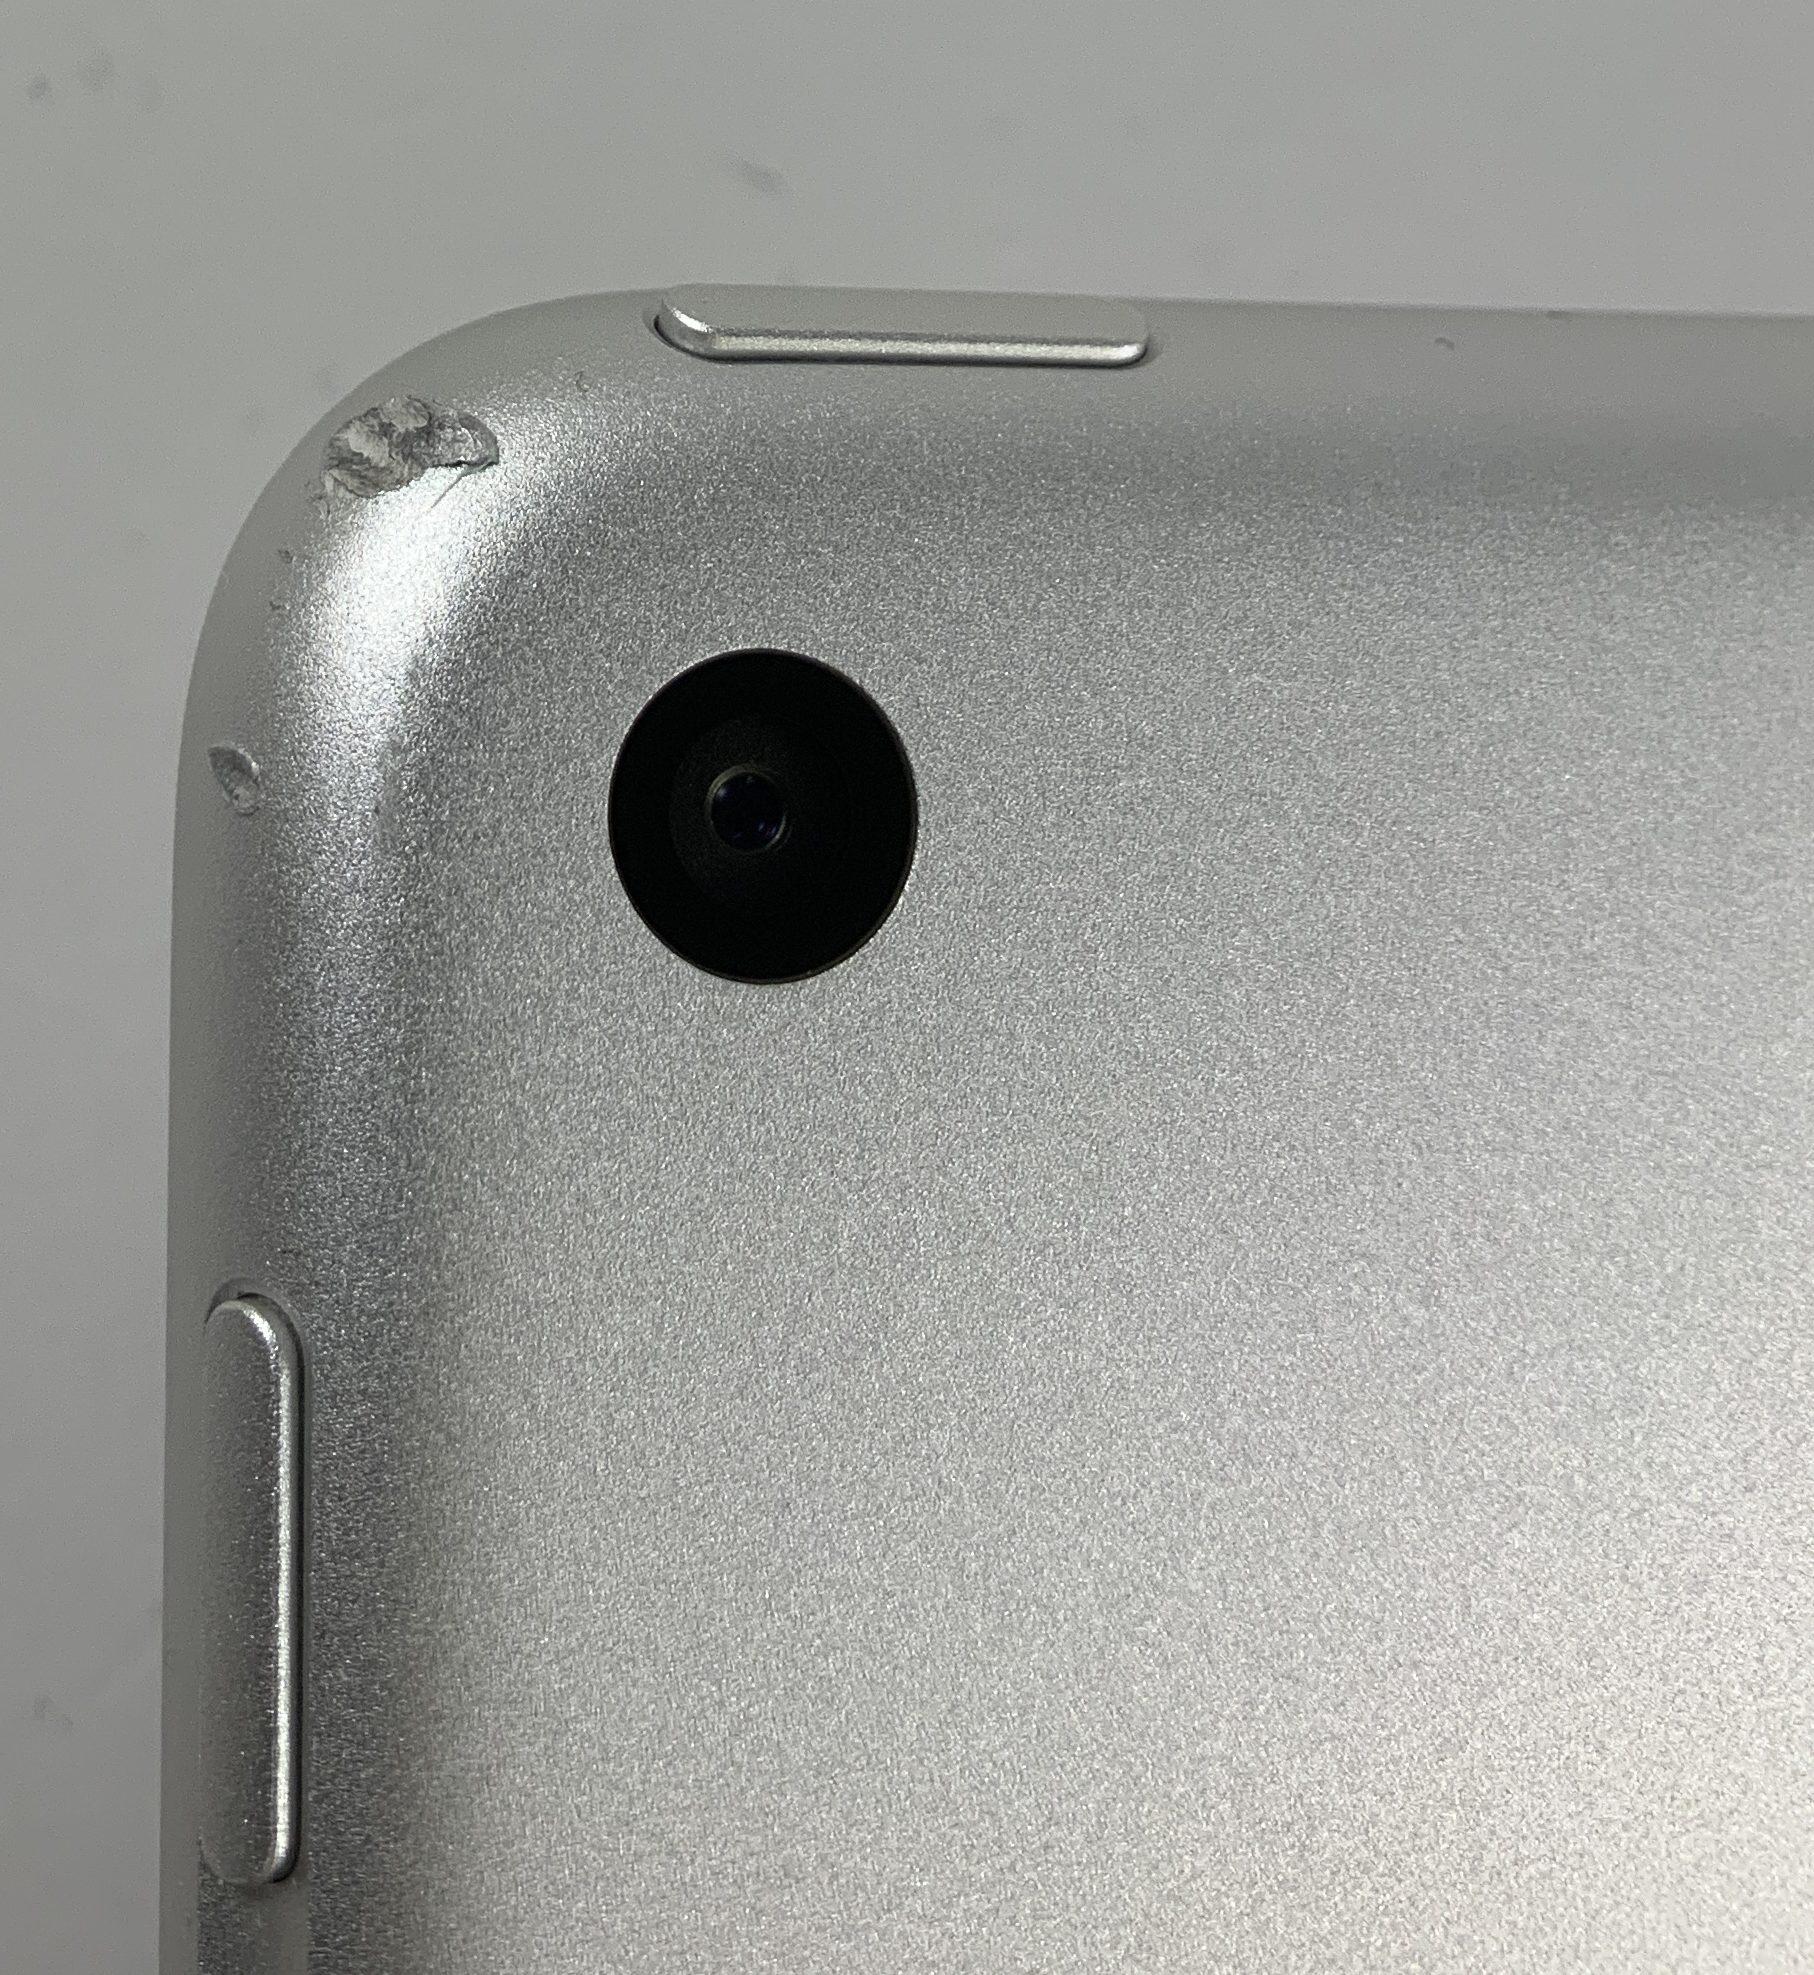 iPad Air 3 Wi-Fi + Cellular 64GB, 64GB, Silver, image 3